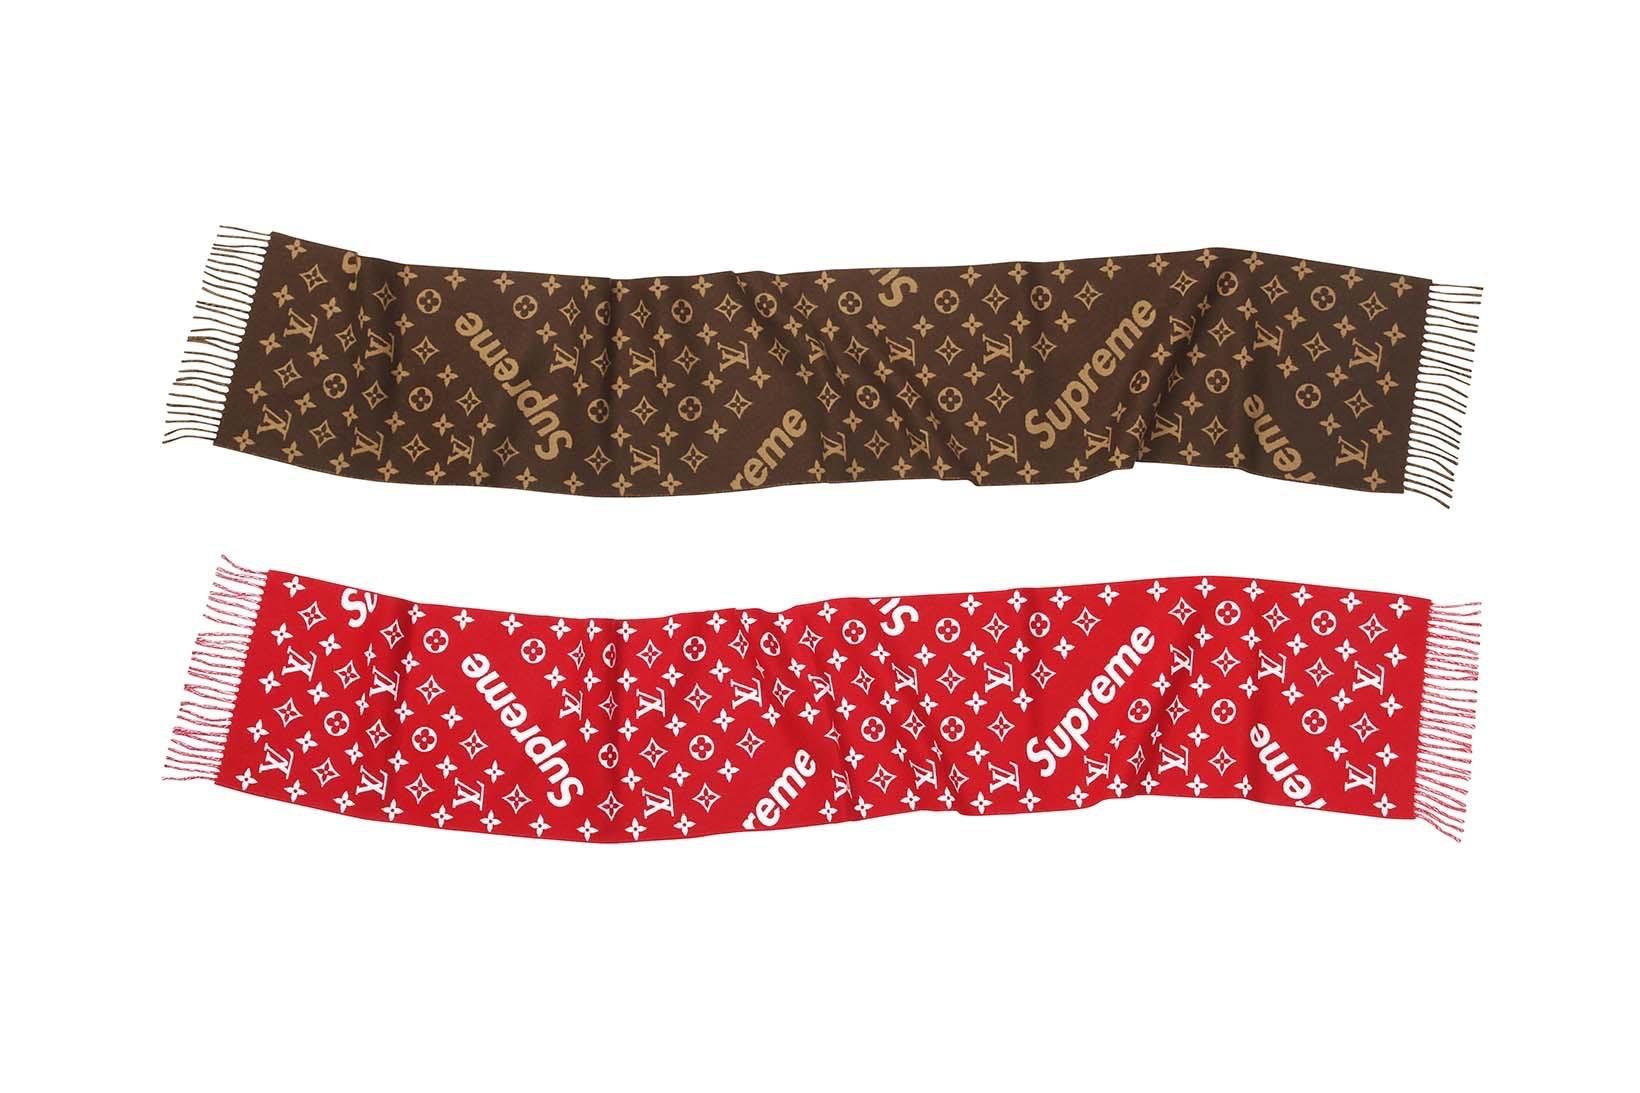 Supreme(シュプリーム)×Louis Vuitton(ルイ・ヴィトン) / モノグラム スカーフ(Monogram Scarf)